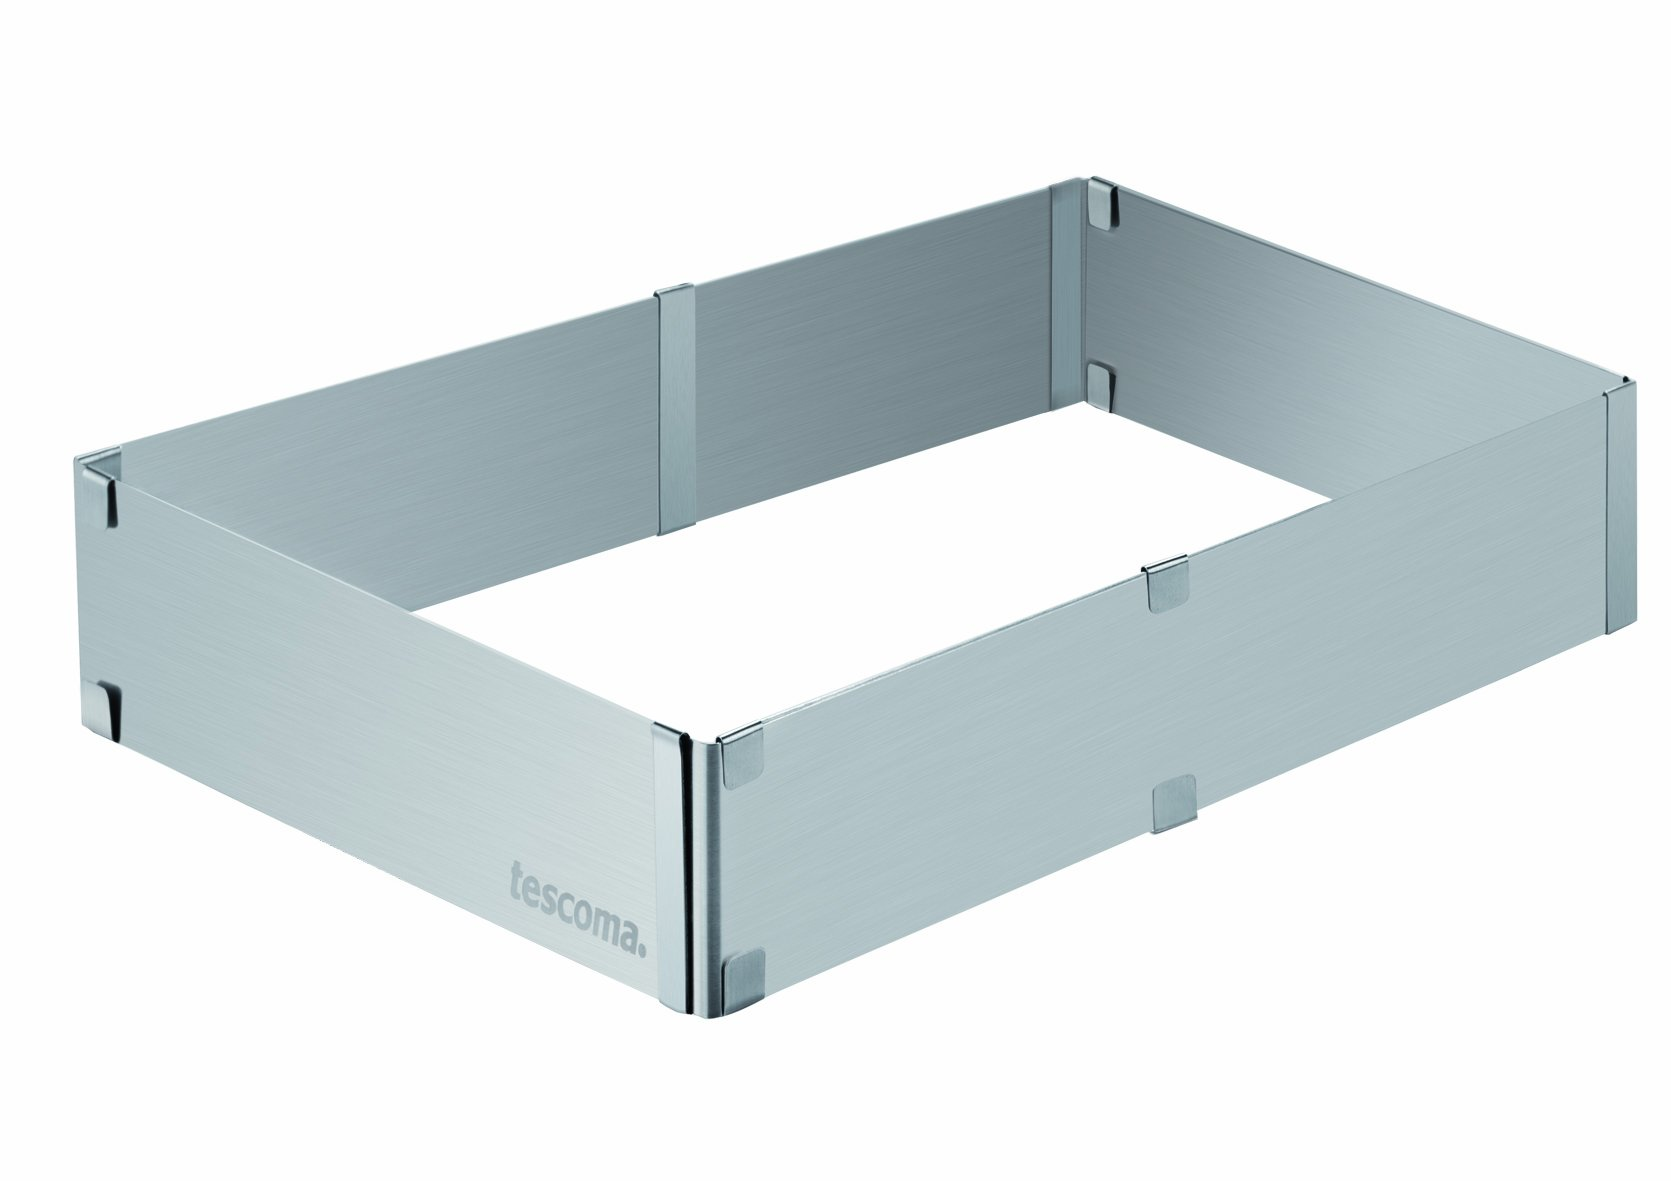 Tescoma adjustable baking frame | rectangular | stainless steel